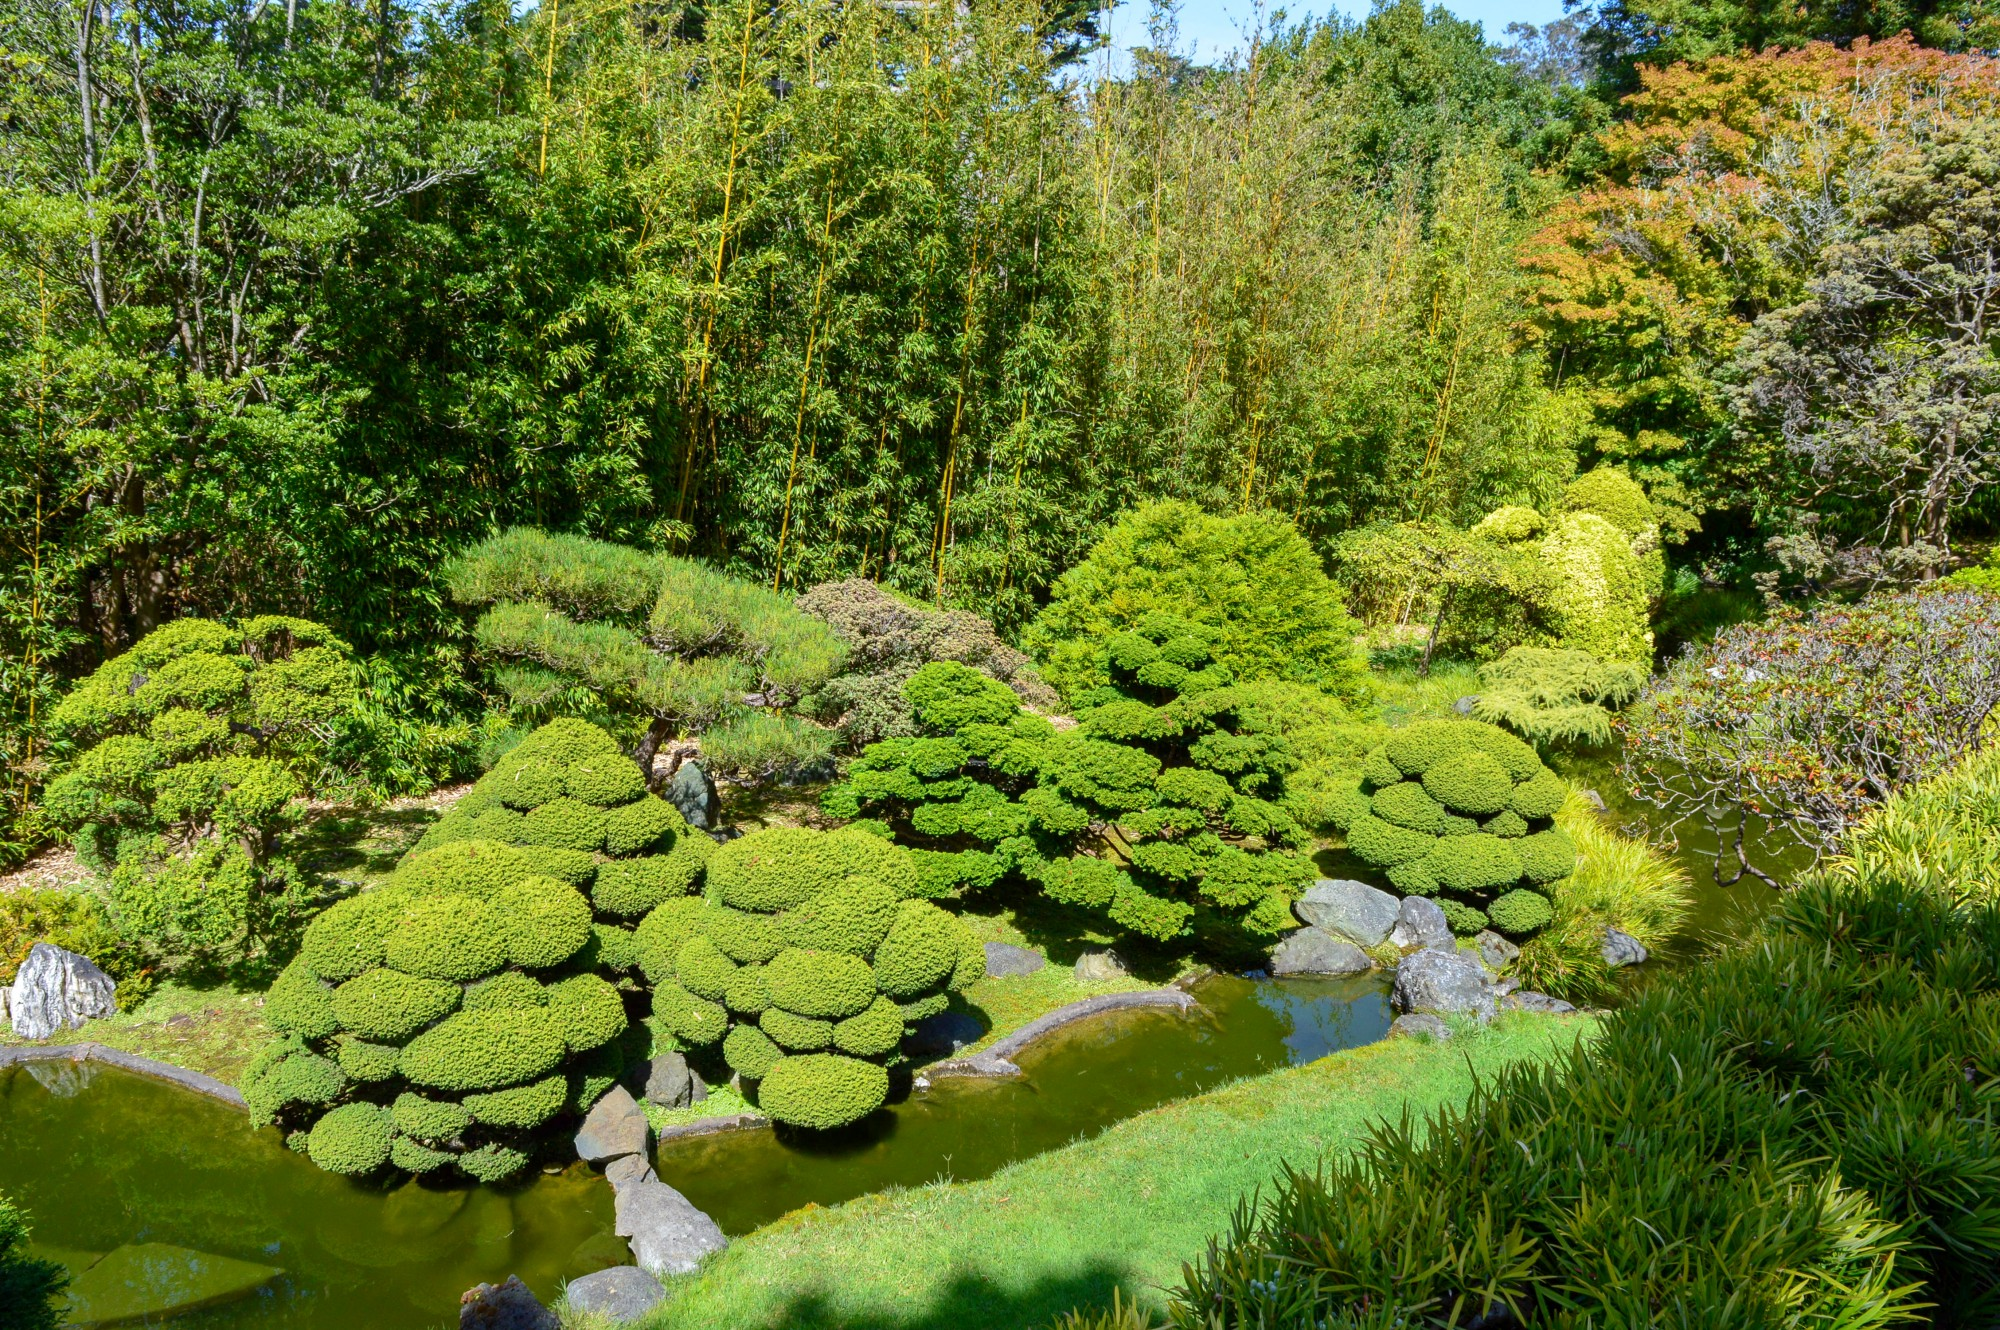 Japanese Garden in the Golden Gate Park, San Francisco